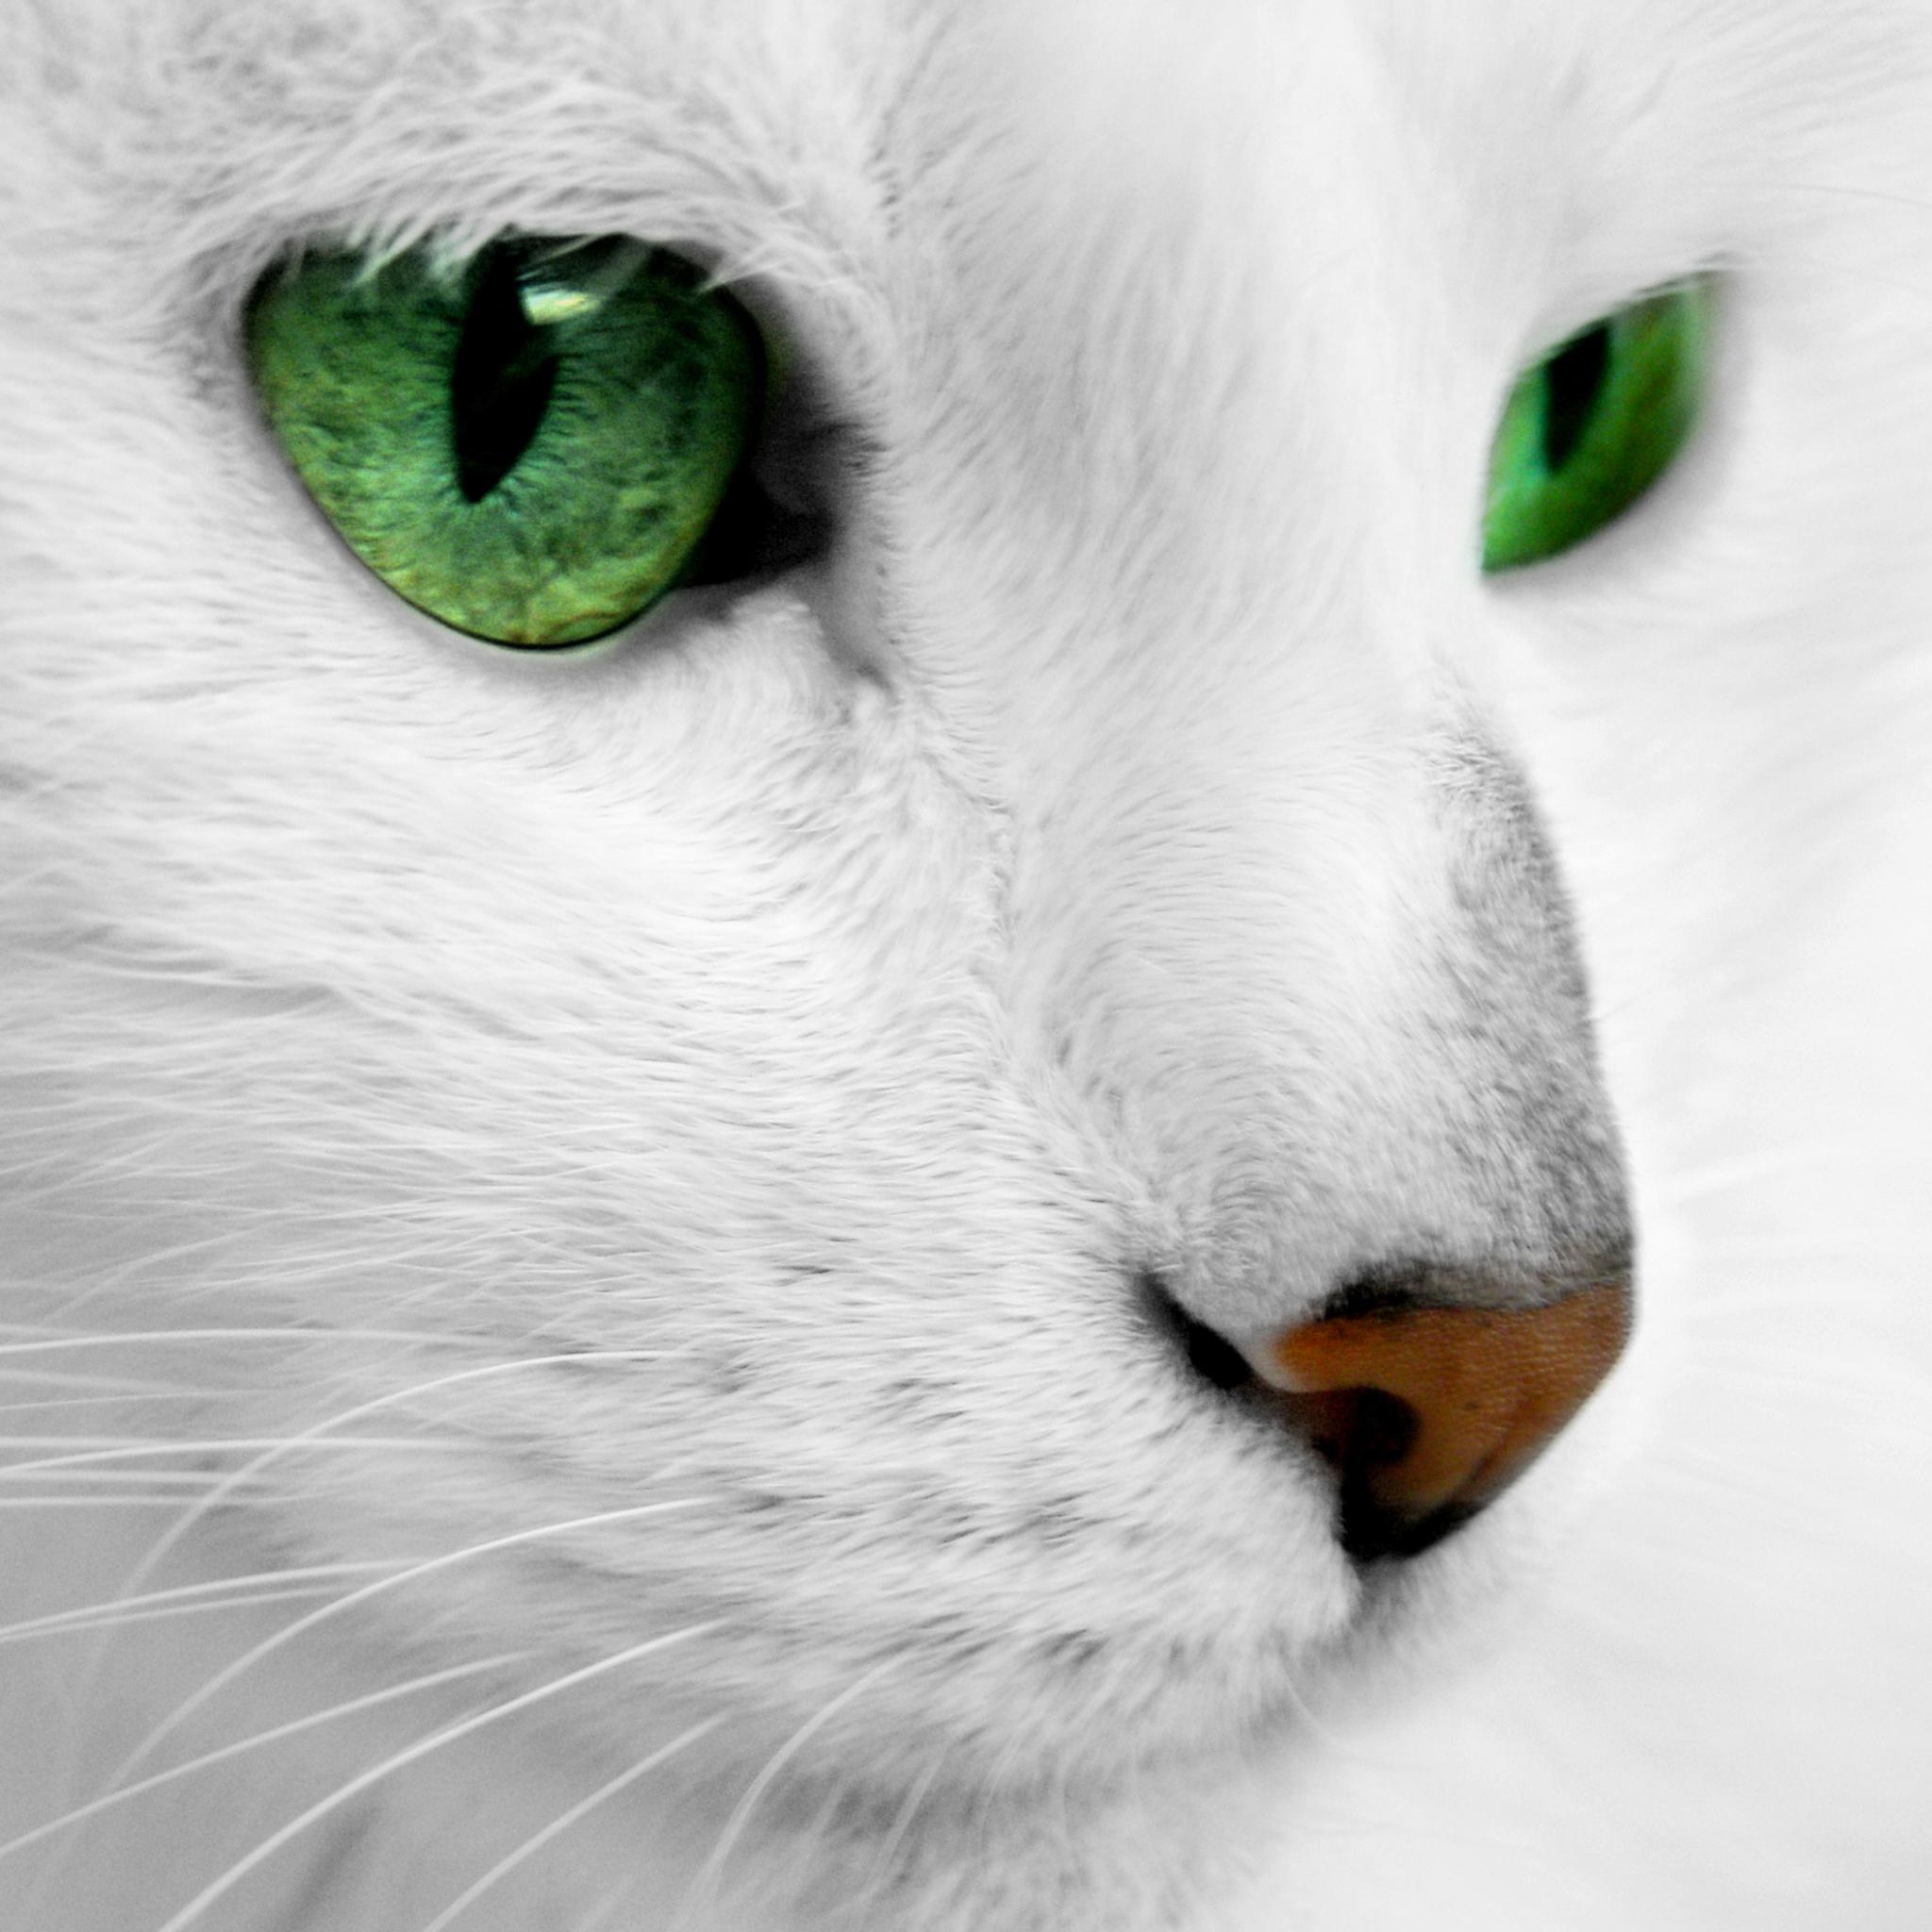 Cat-Eye-Green-3Wallpapers-ipad-Retina